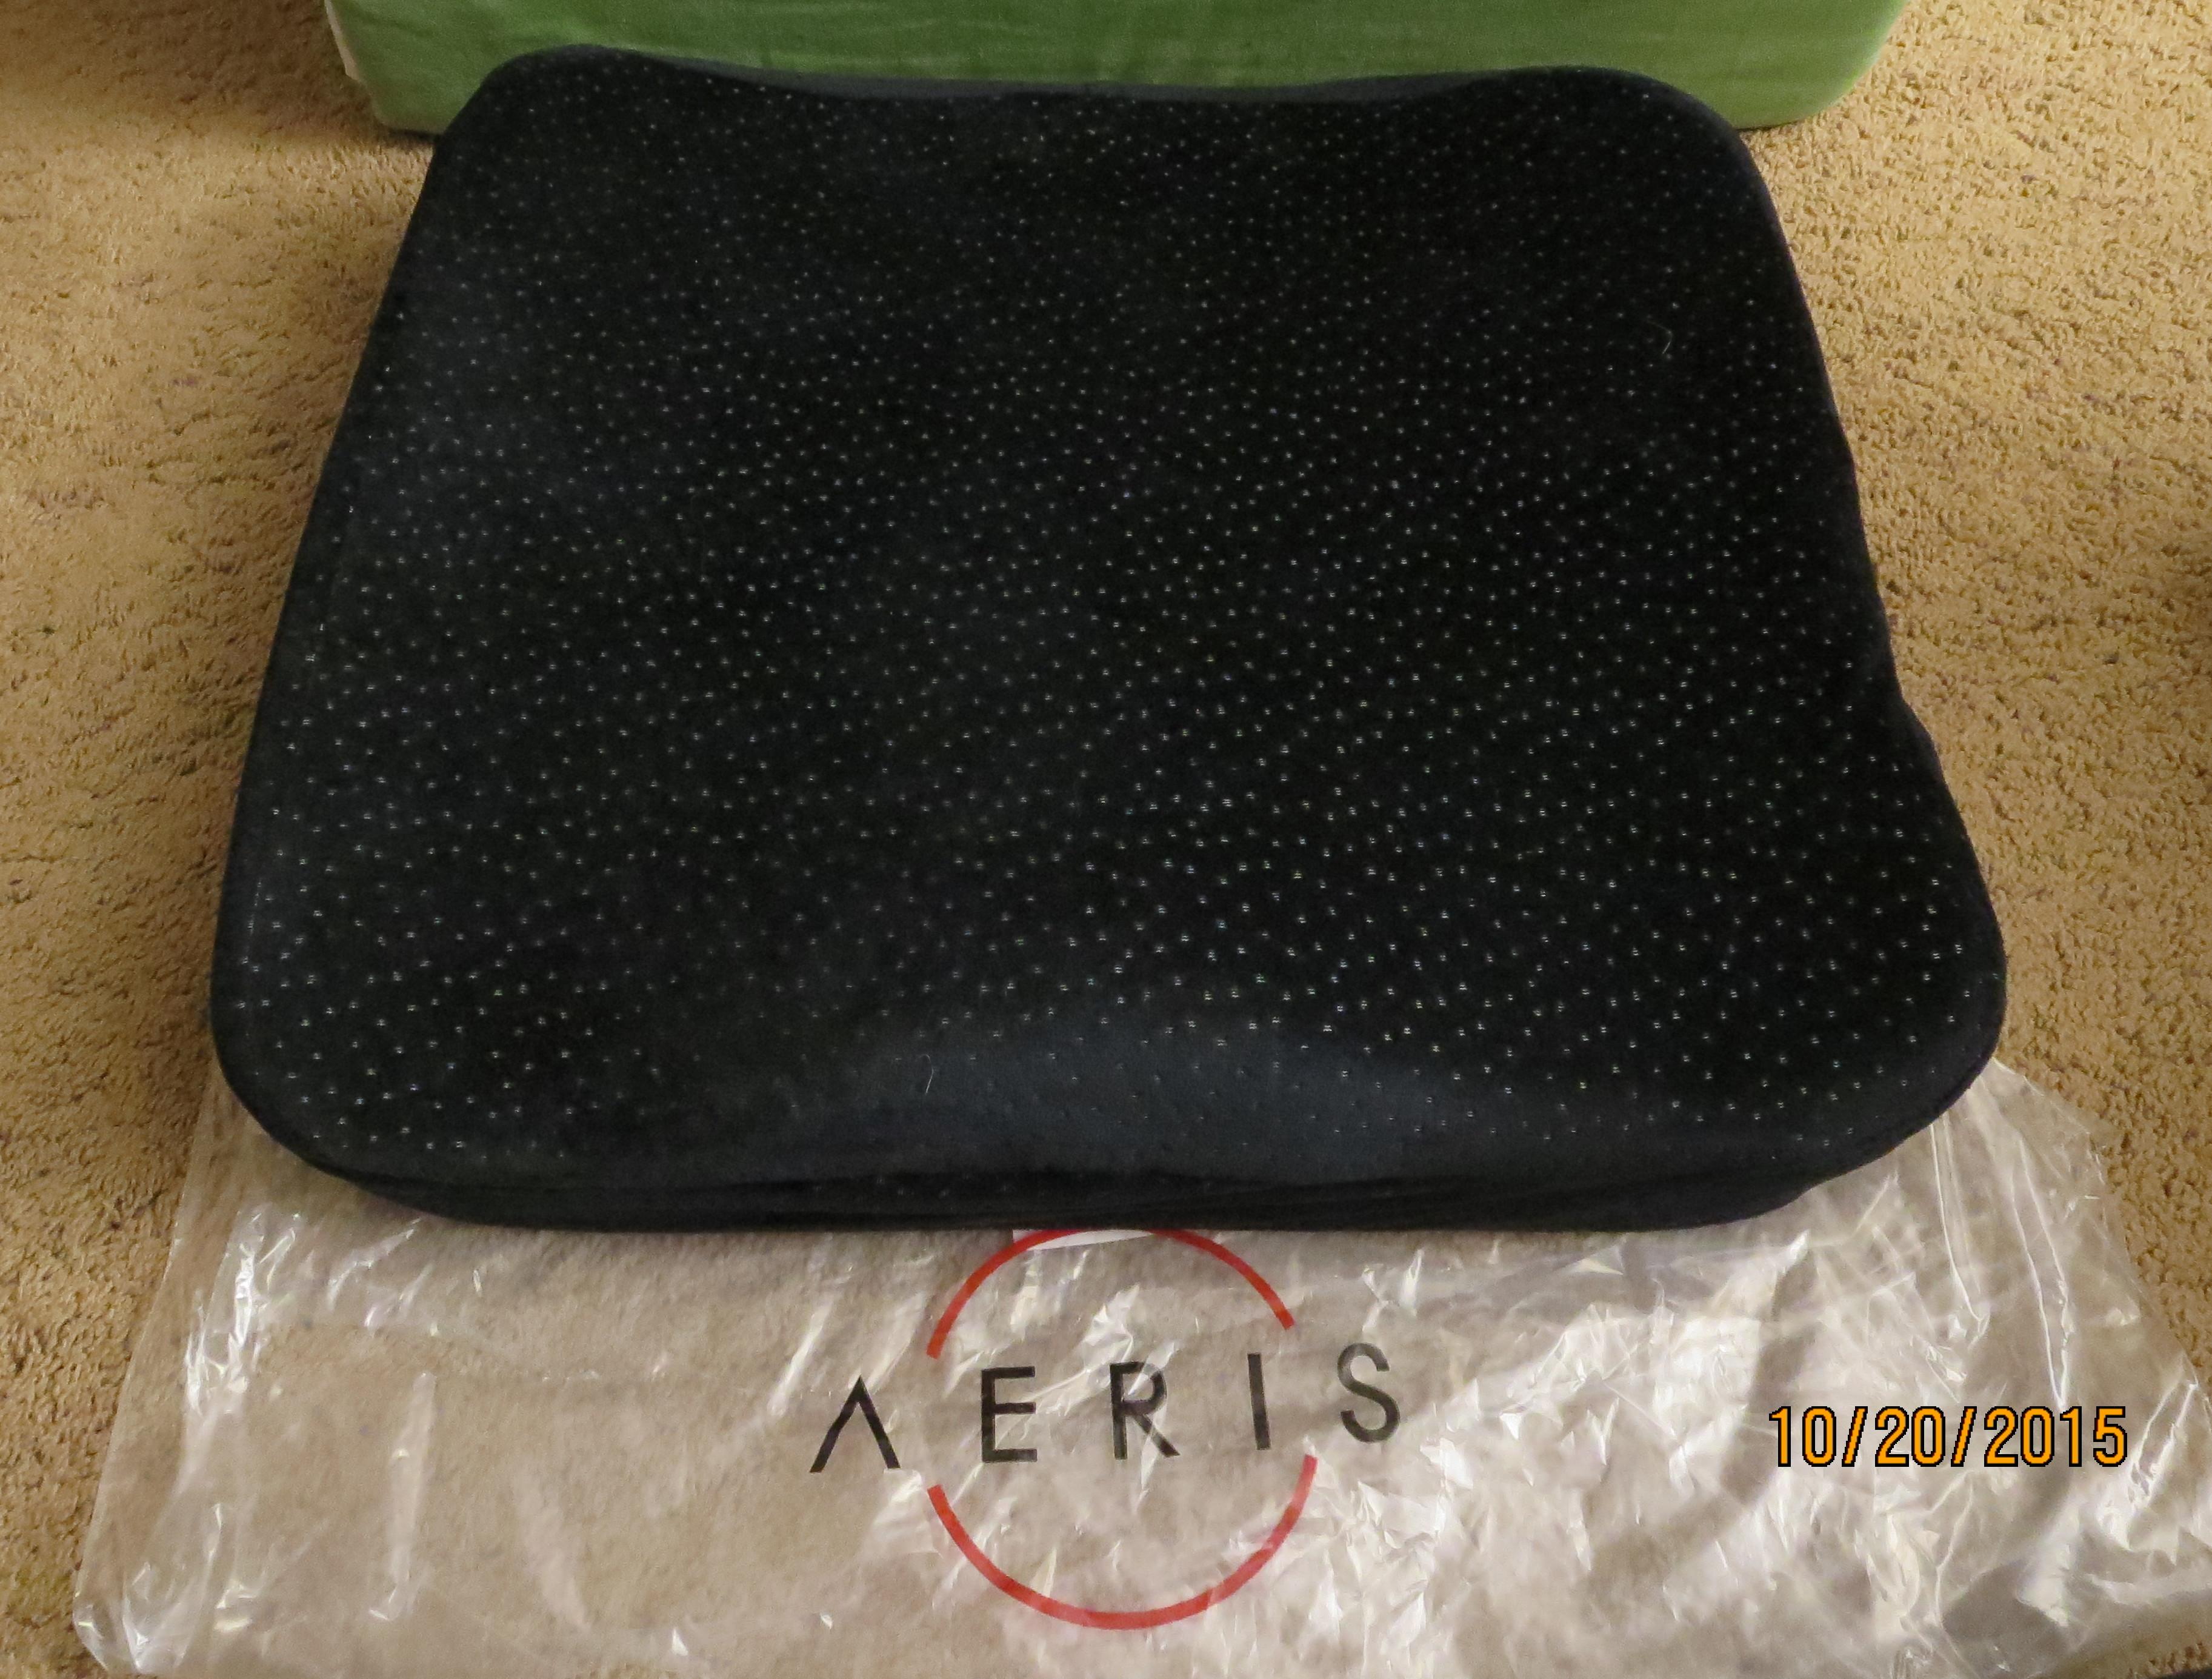 Aeris Memory Foam Seat Cushion Review